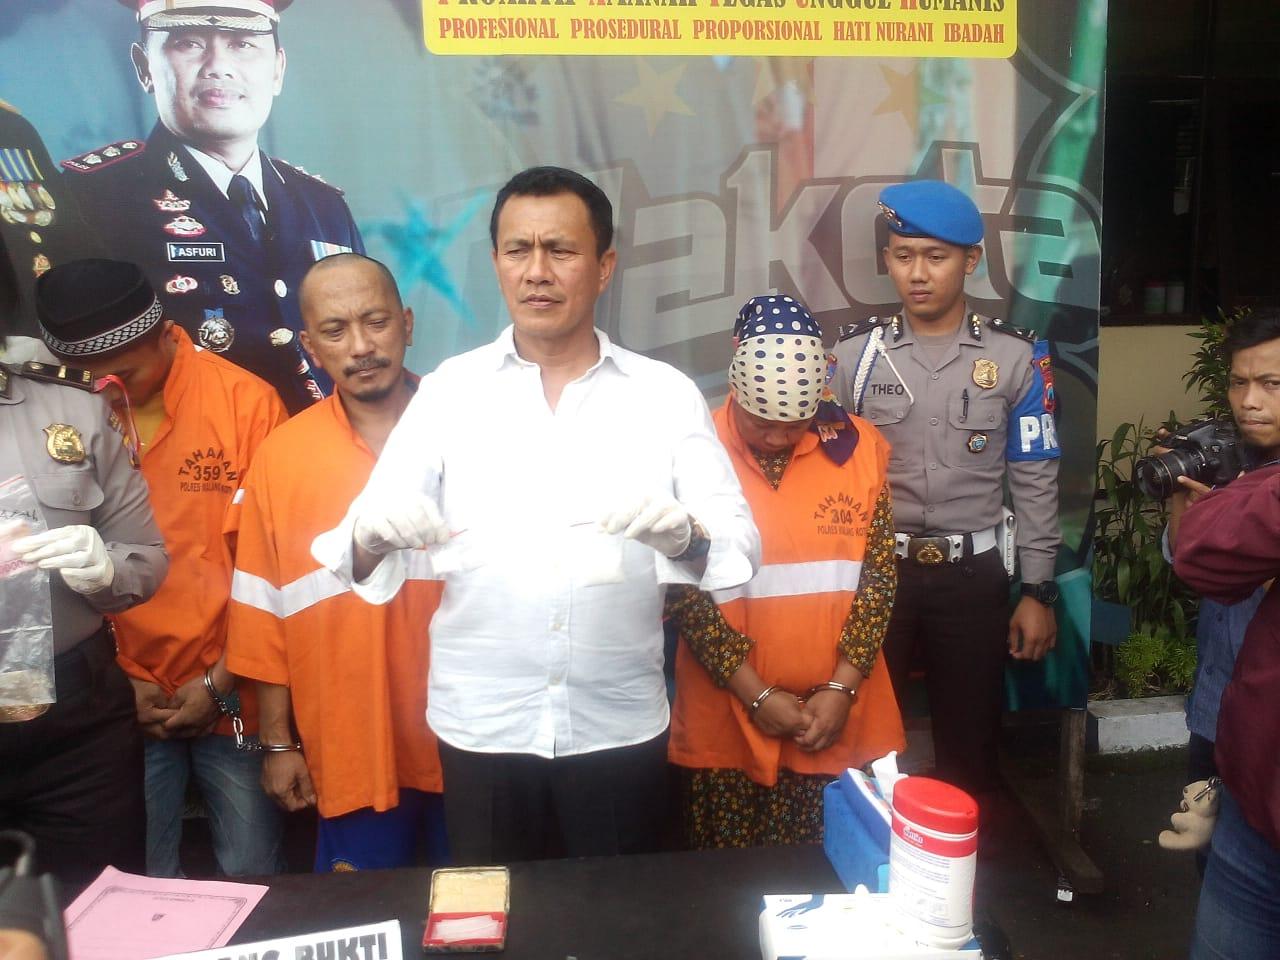 Bawa Sabu, Satreskoba Polresta Malang Bekuk Pasutri